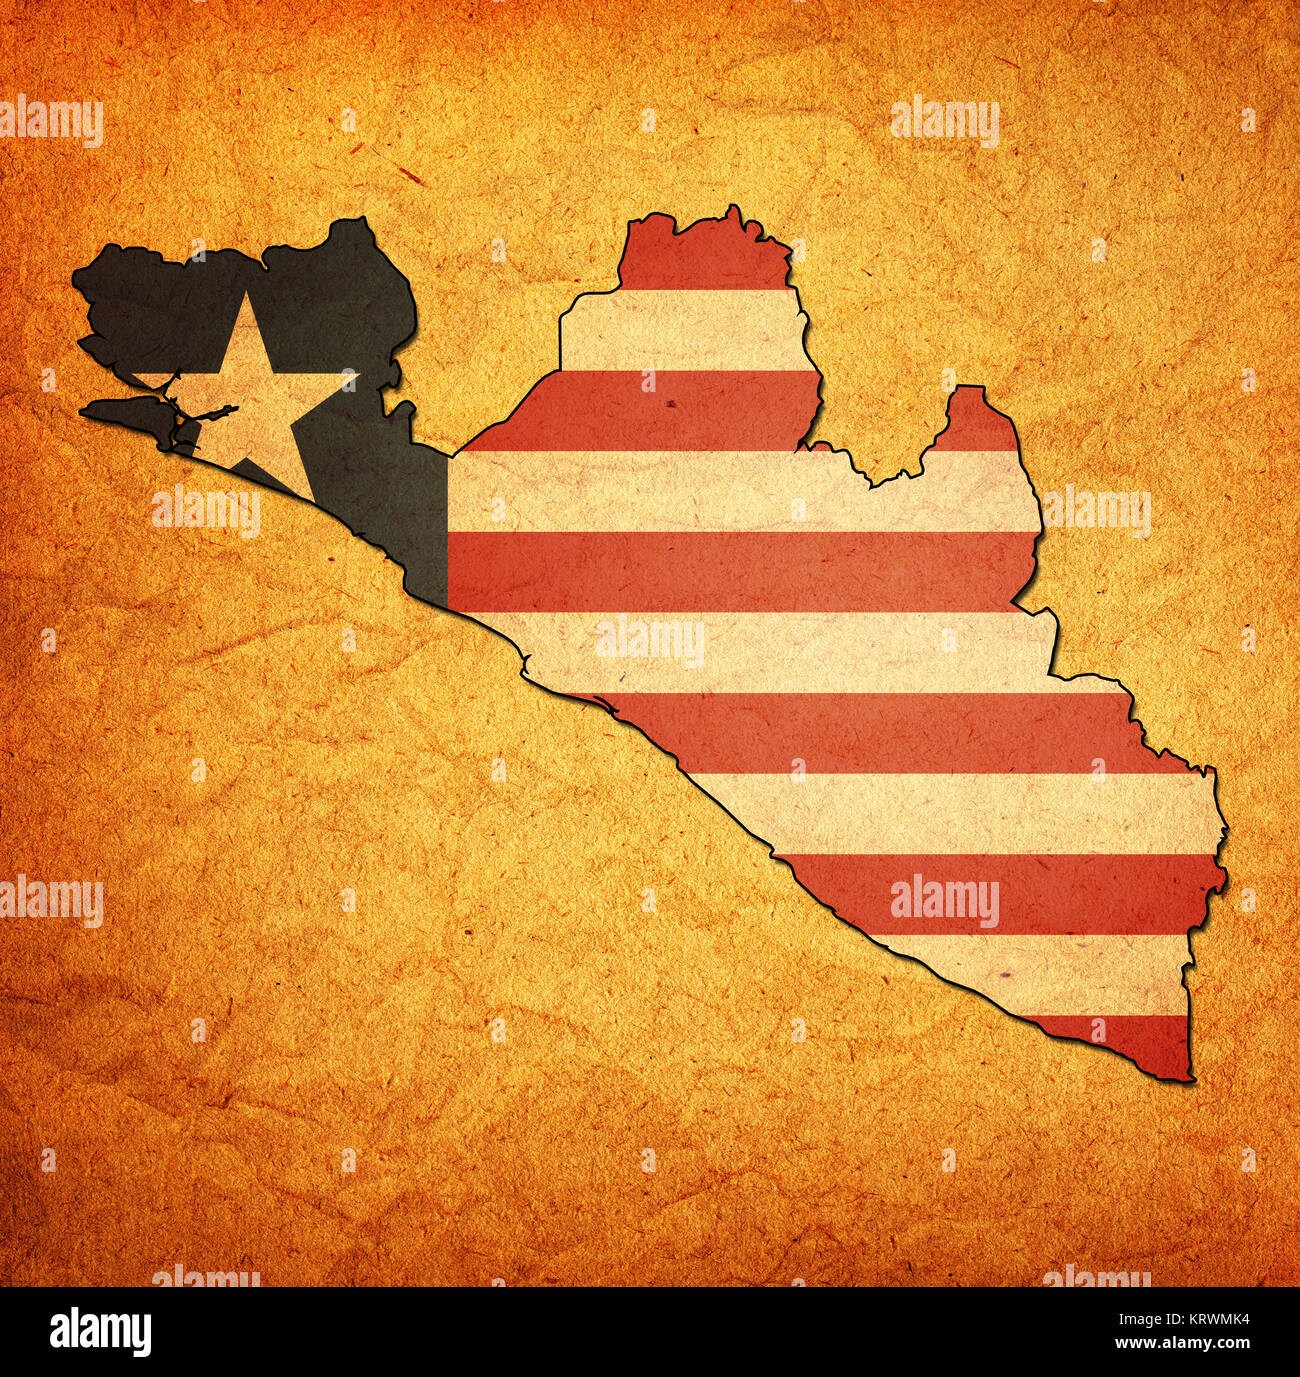 liberia territory with flag - Stock Image